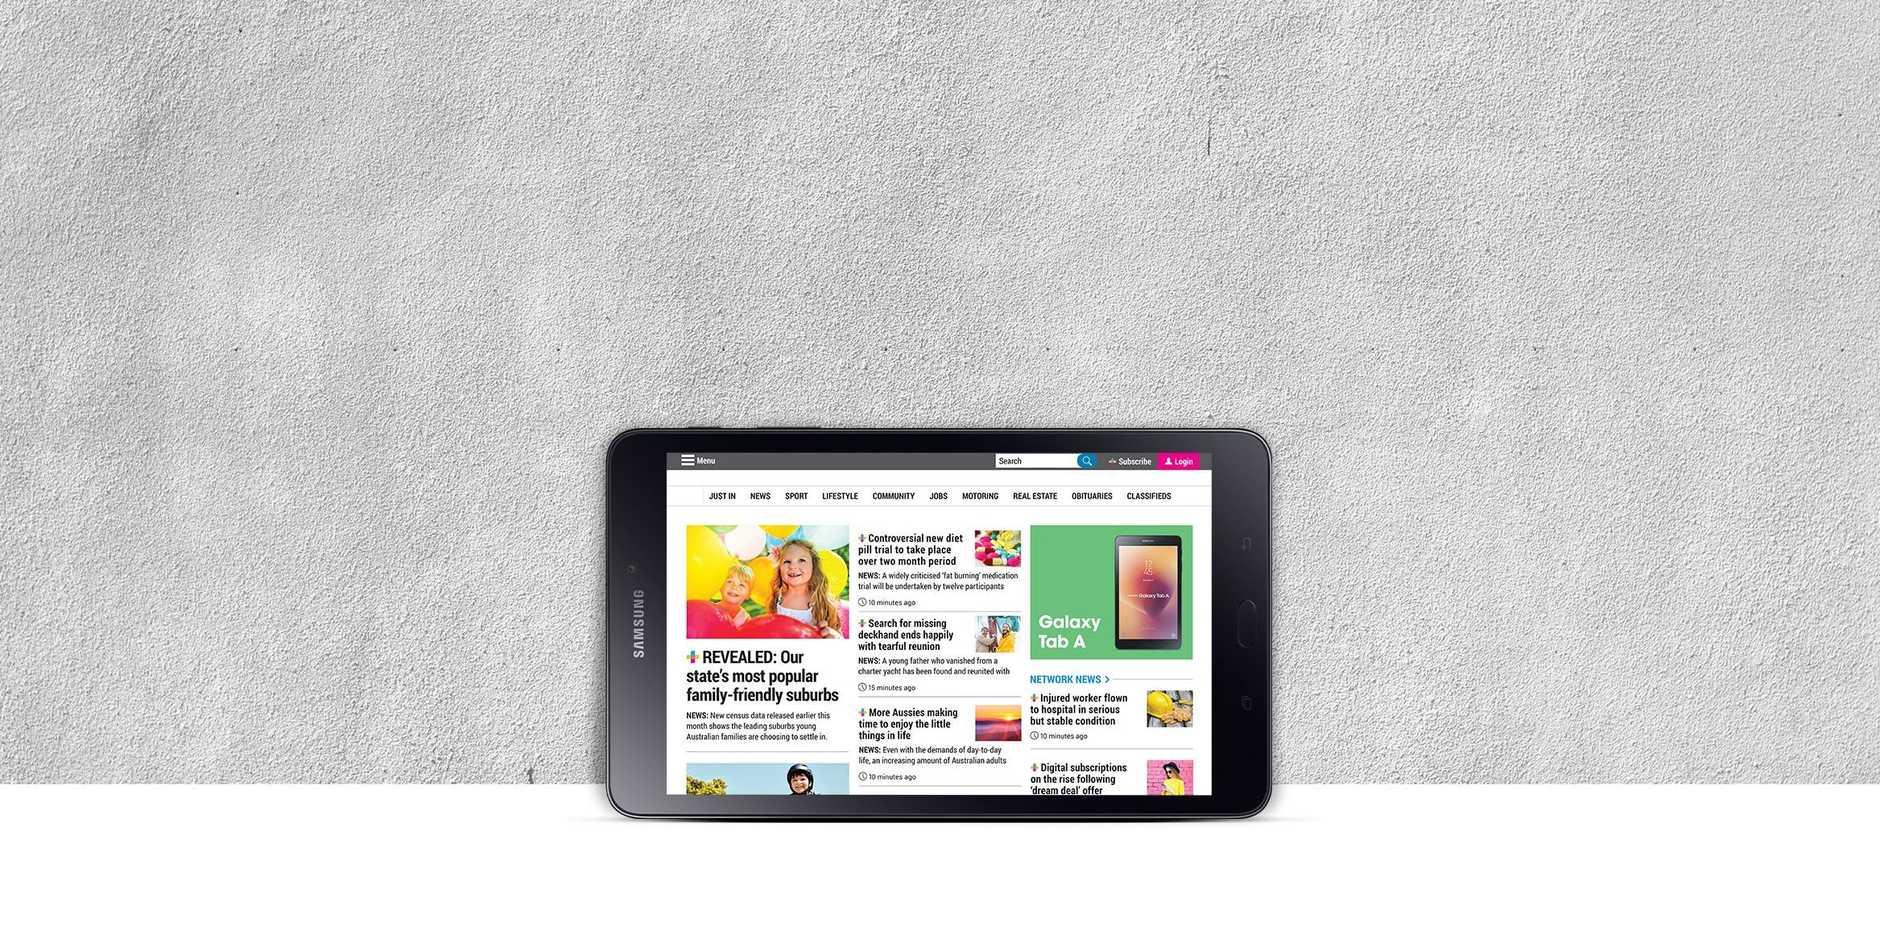 The Samsung Galaxy Tab A 8.0 tablet.